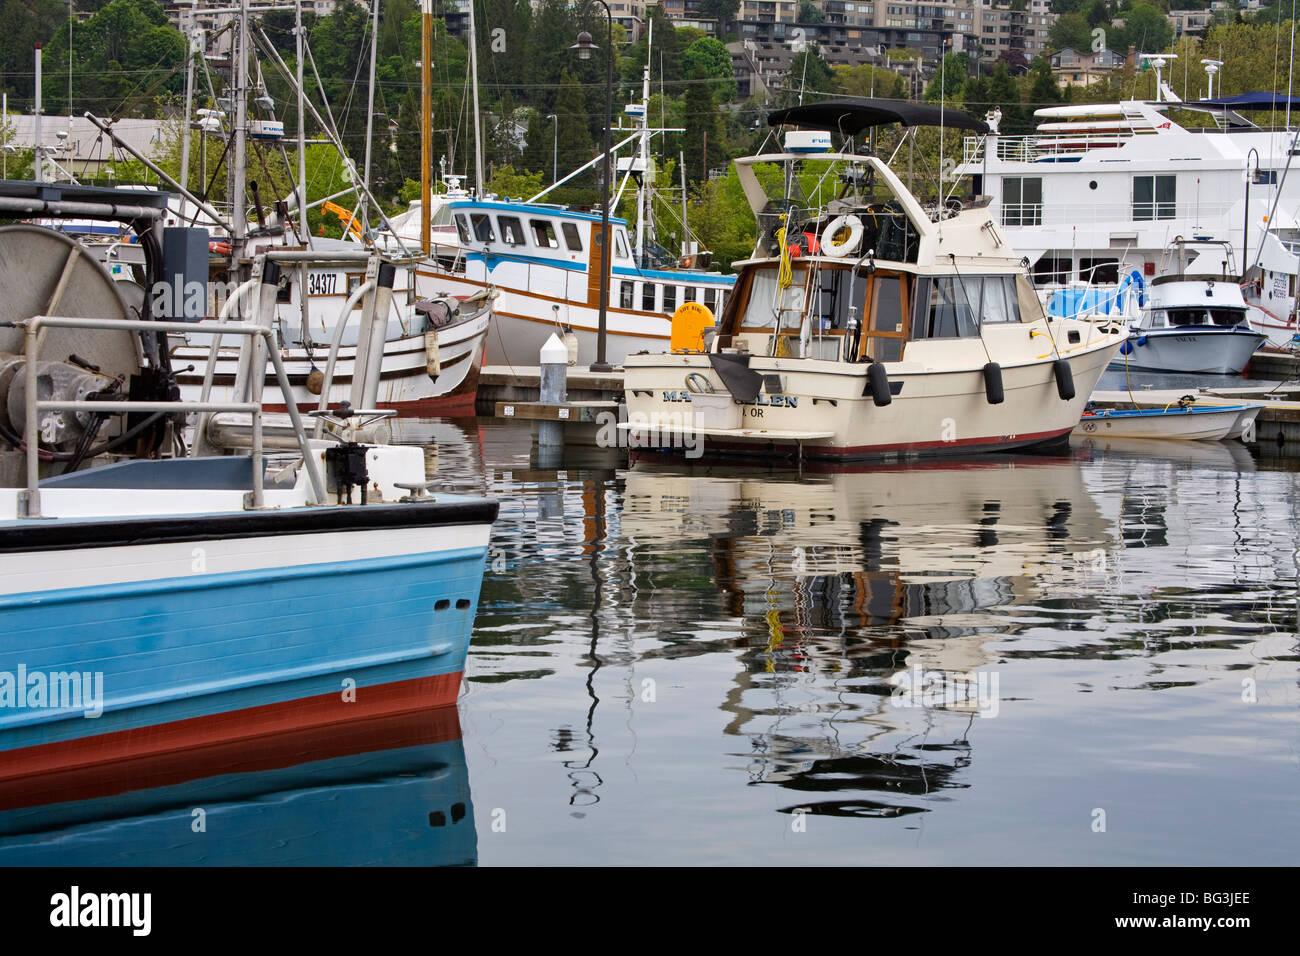 Fishermen's Terminal, Seattle, Washington State, United States of America, North America - Stock Image